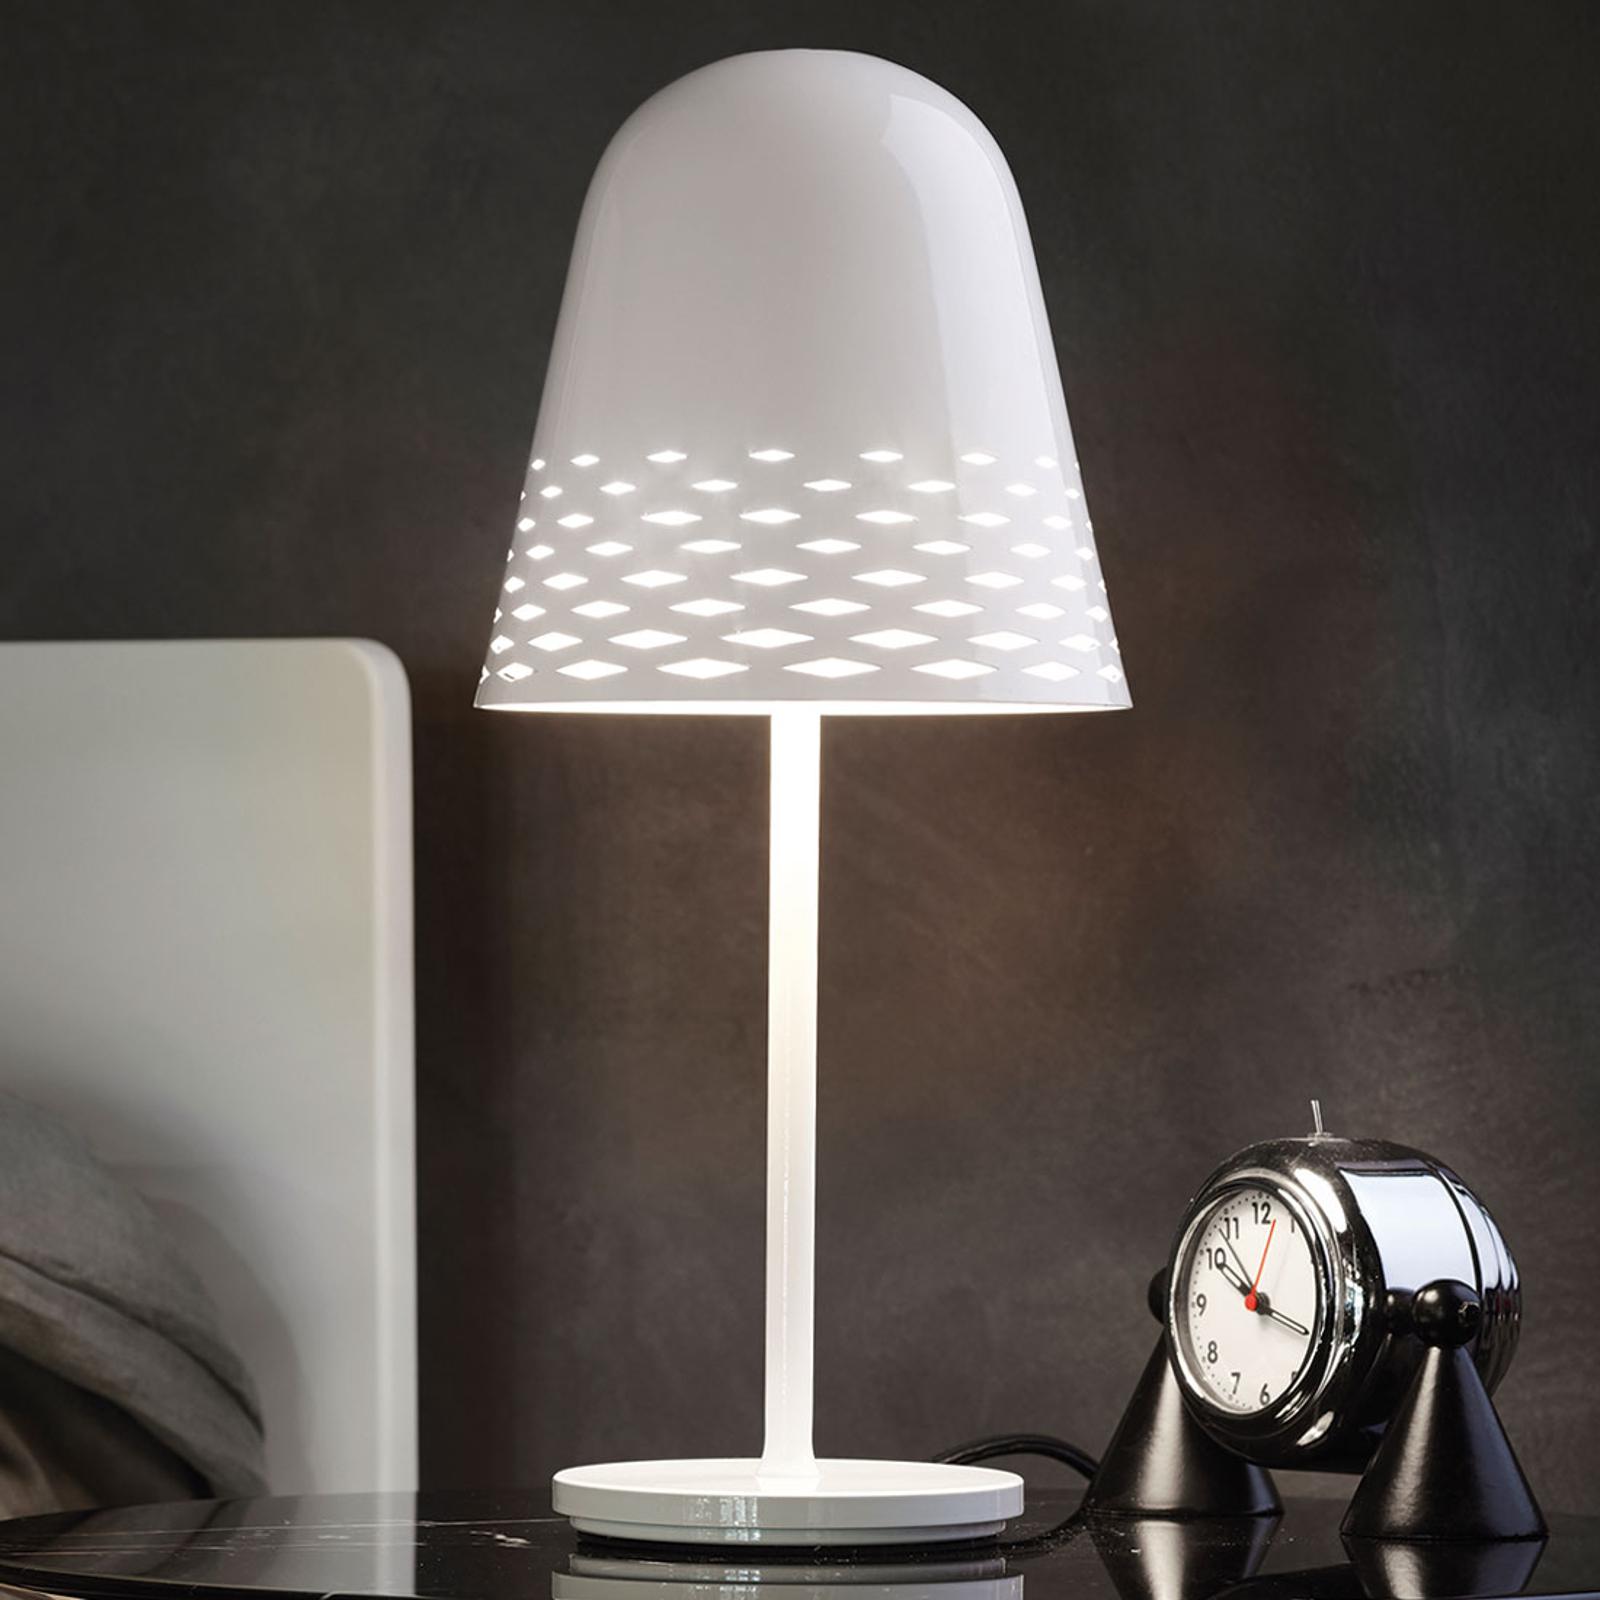 Rotaliana Capri - lampe à poser blanc, 40cm haut